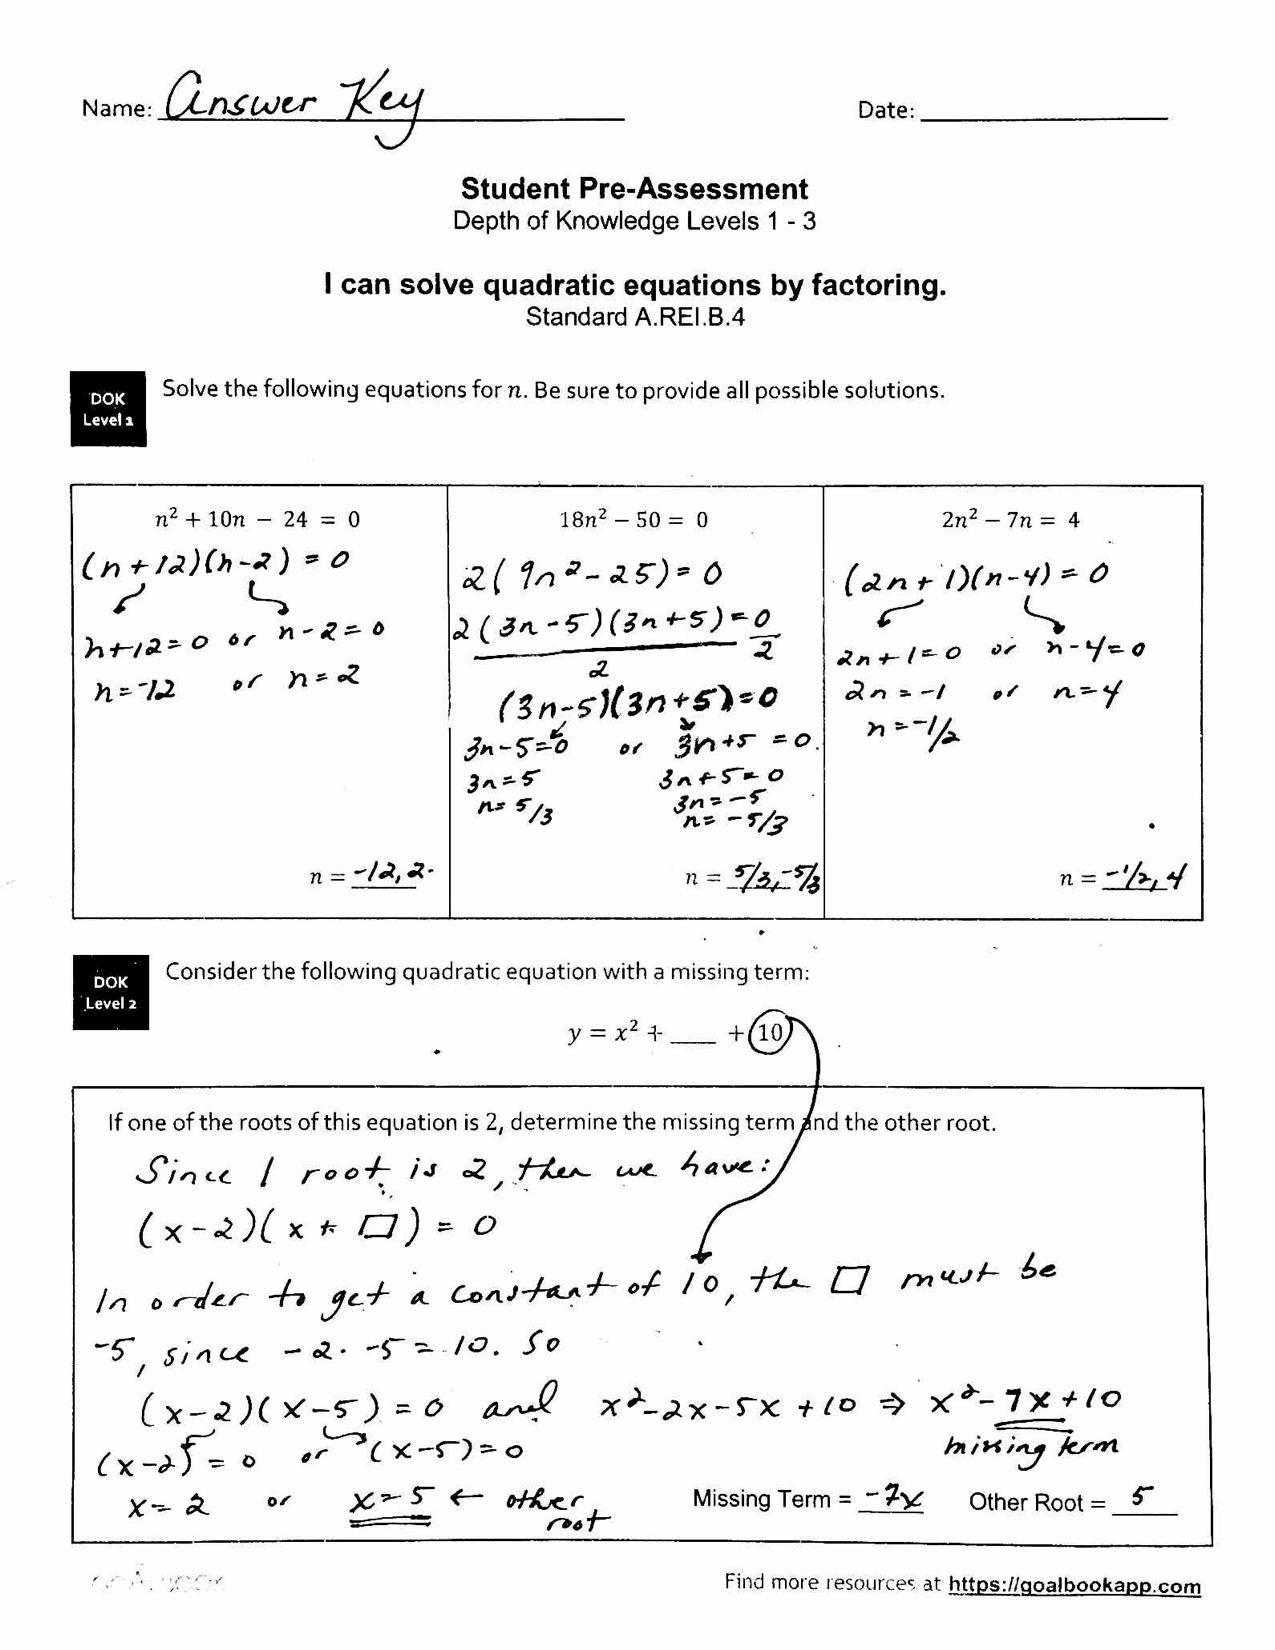 Hsa Rei 4 Solve Quadratic Equations